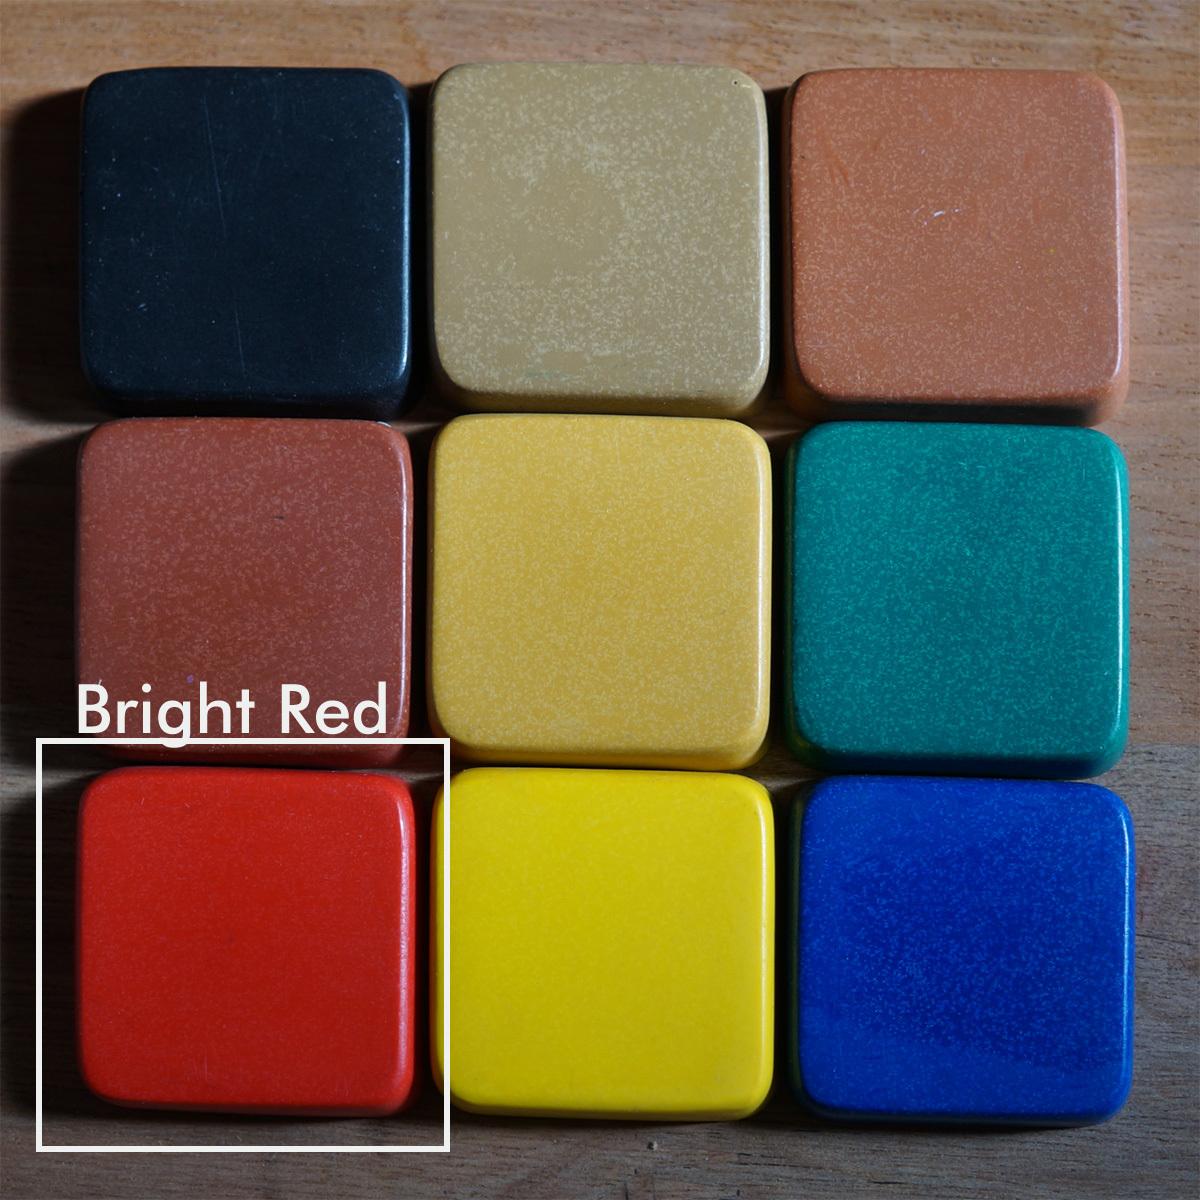 PIGMENT BRIGHT RED 300g(着色剤:赤 300g) - 画像2